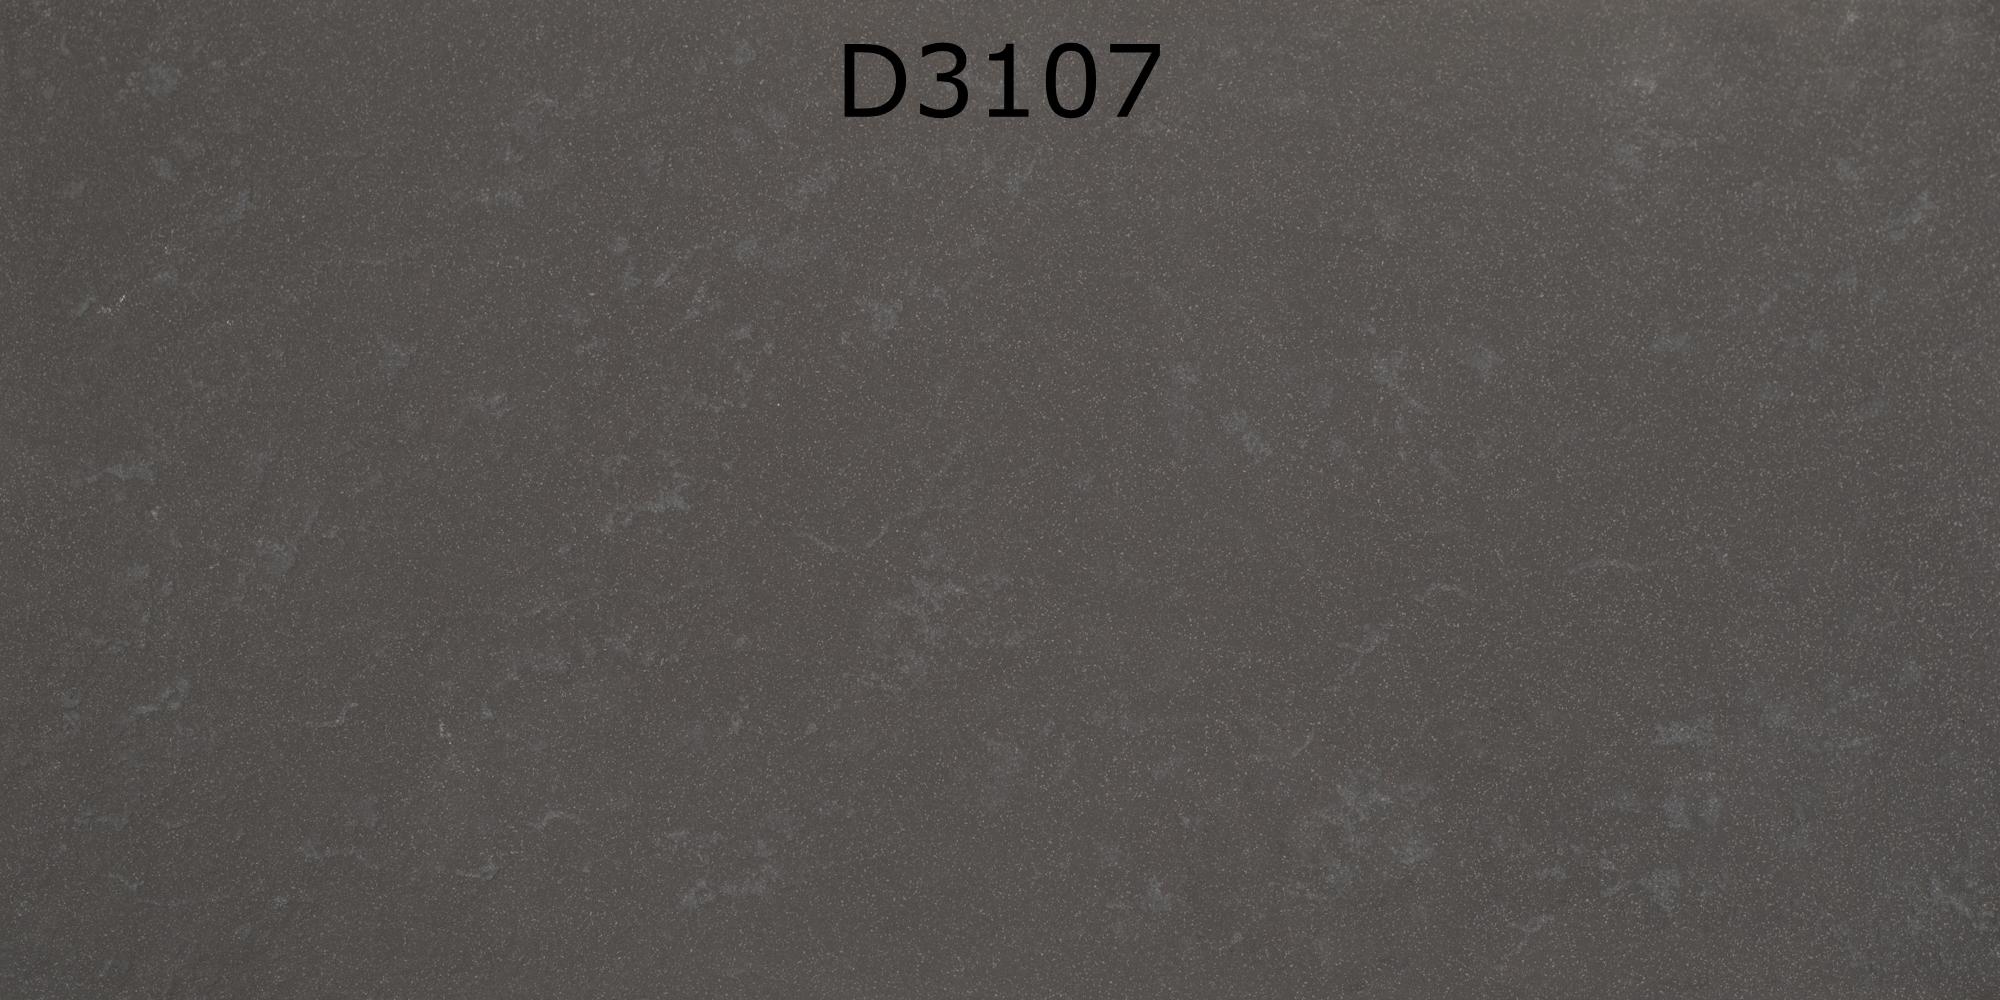 D3107